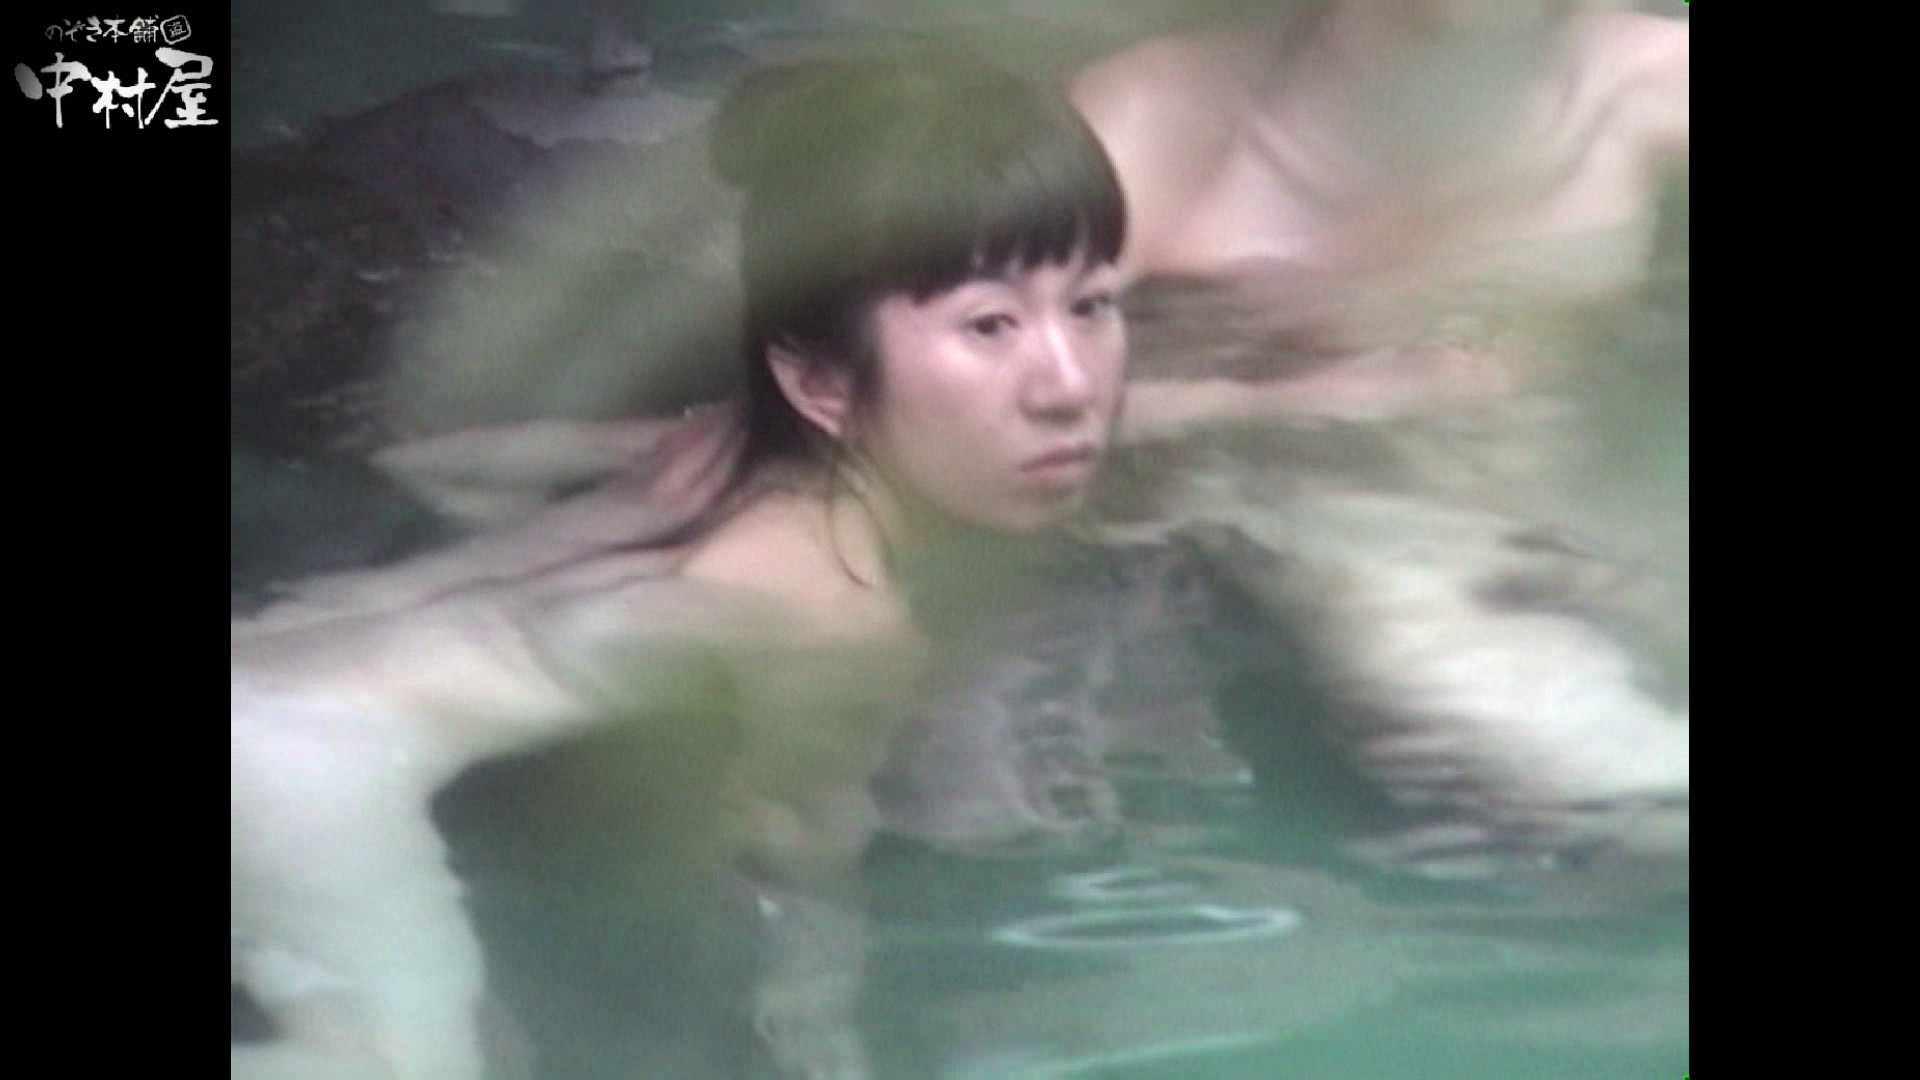 Aquaな露天風呂Vol.953 盗撮師作品  70pic 45